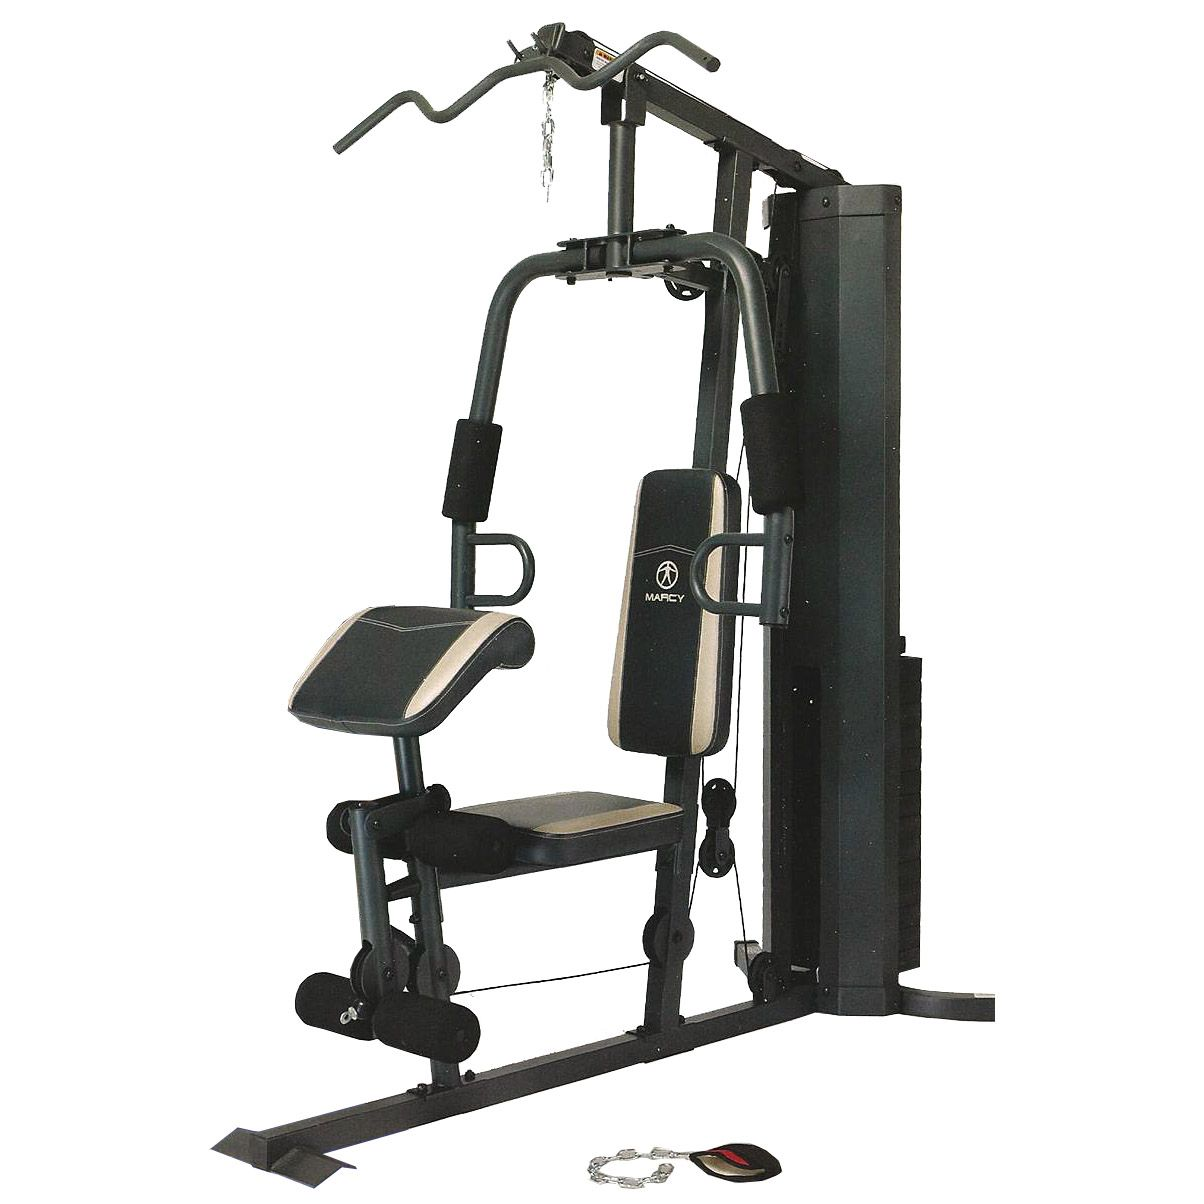 Marcy multi gym ebay, cardio equipment for hire pretoria